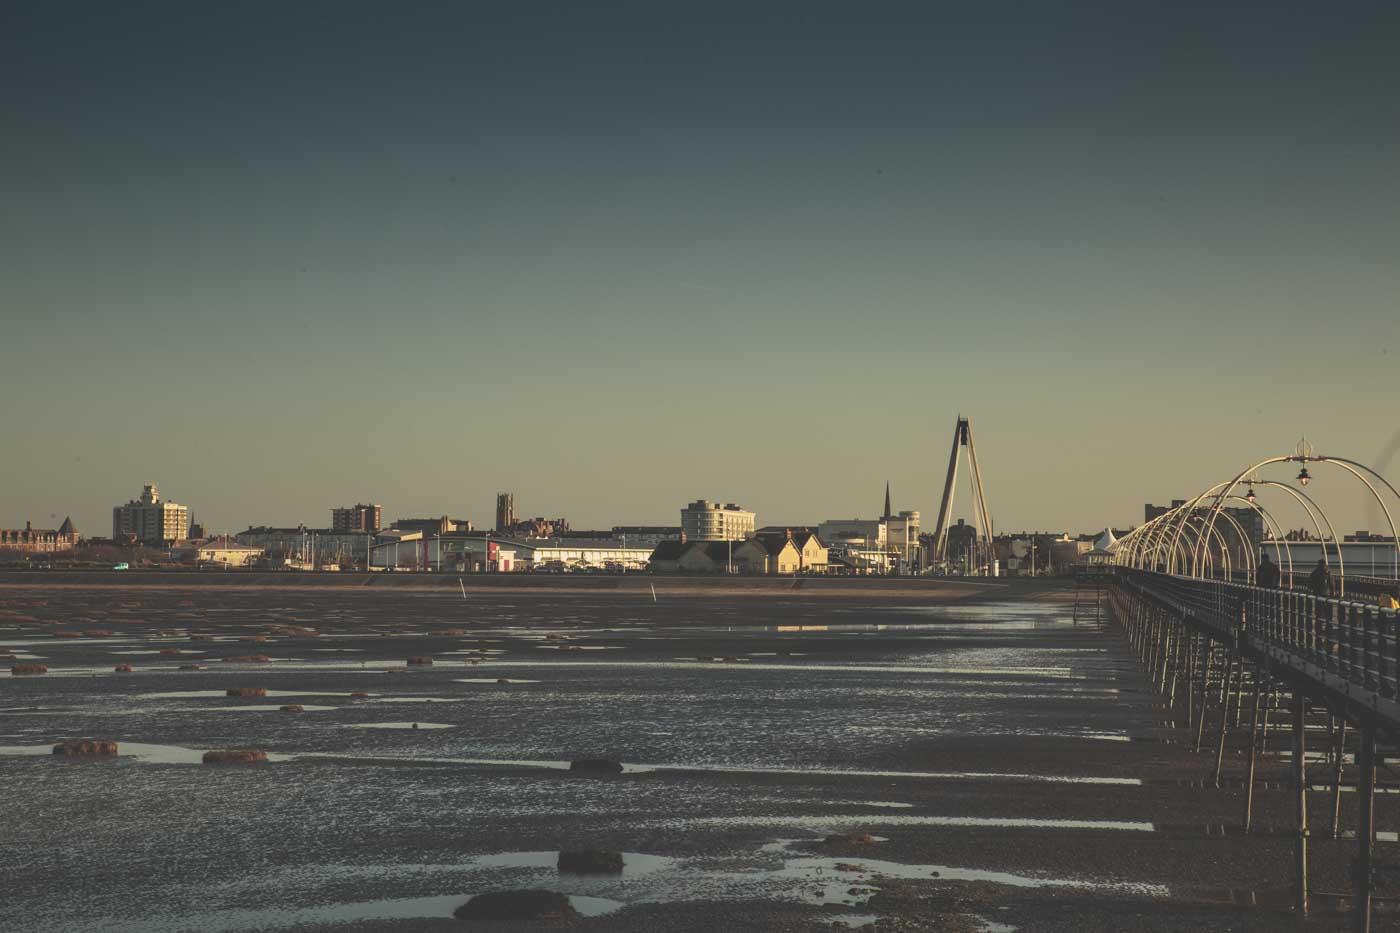 southport skyline, pier, sun